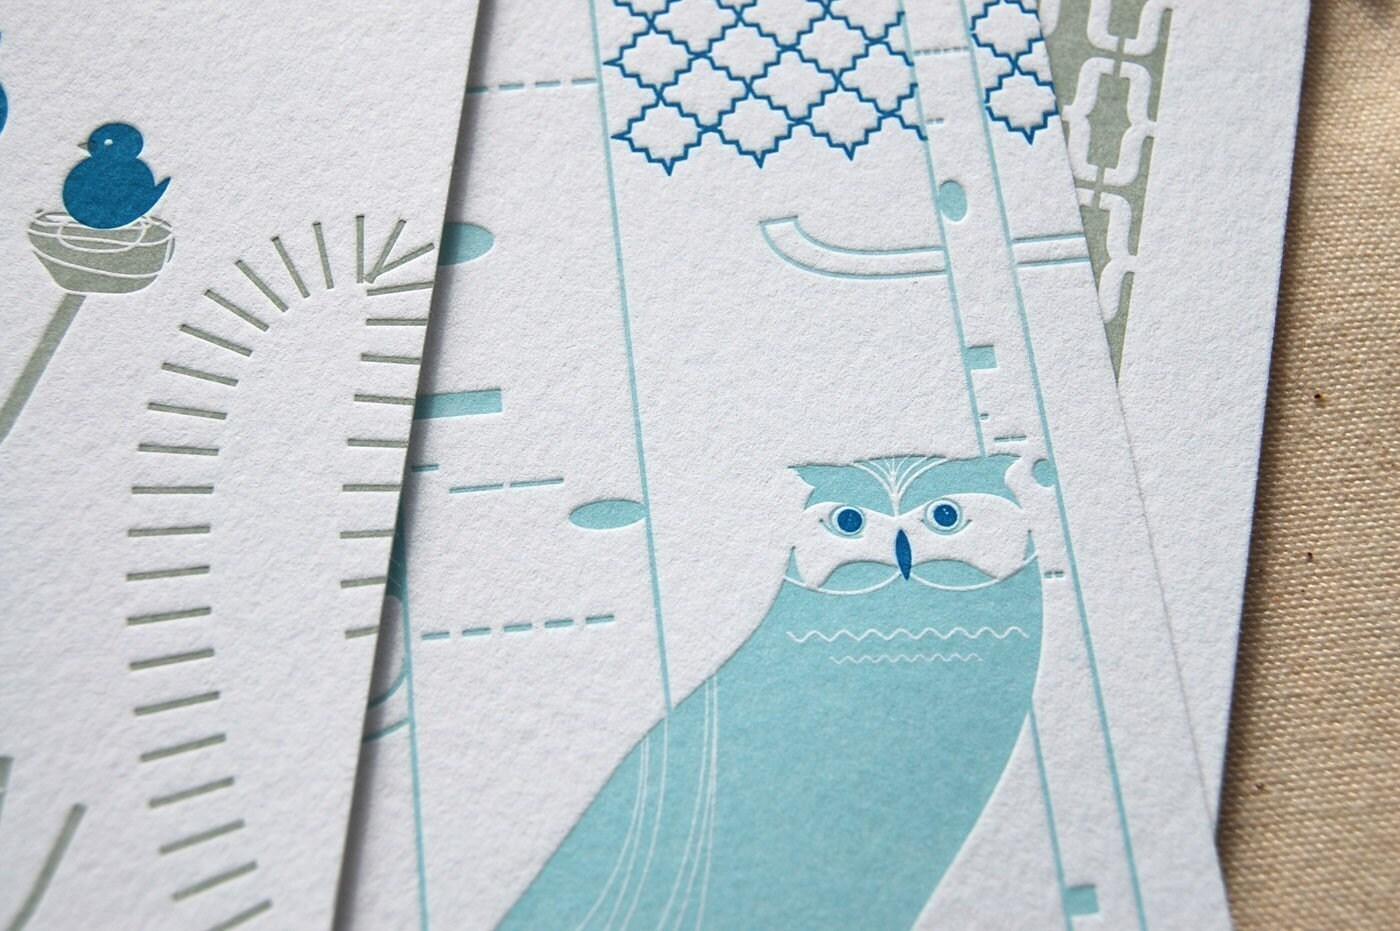 Etsy :: tarahogan :: 2009 Letterpress Wall Calendar Collaboration